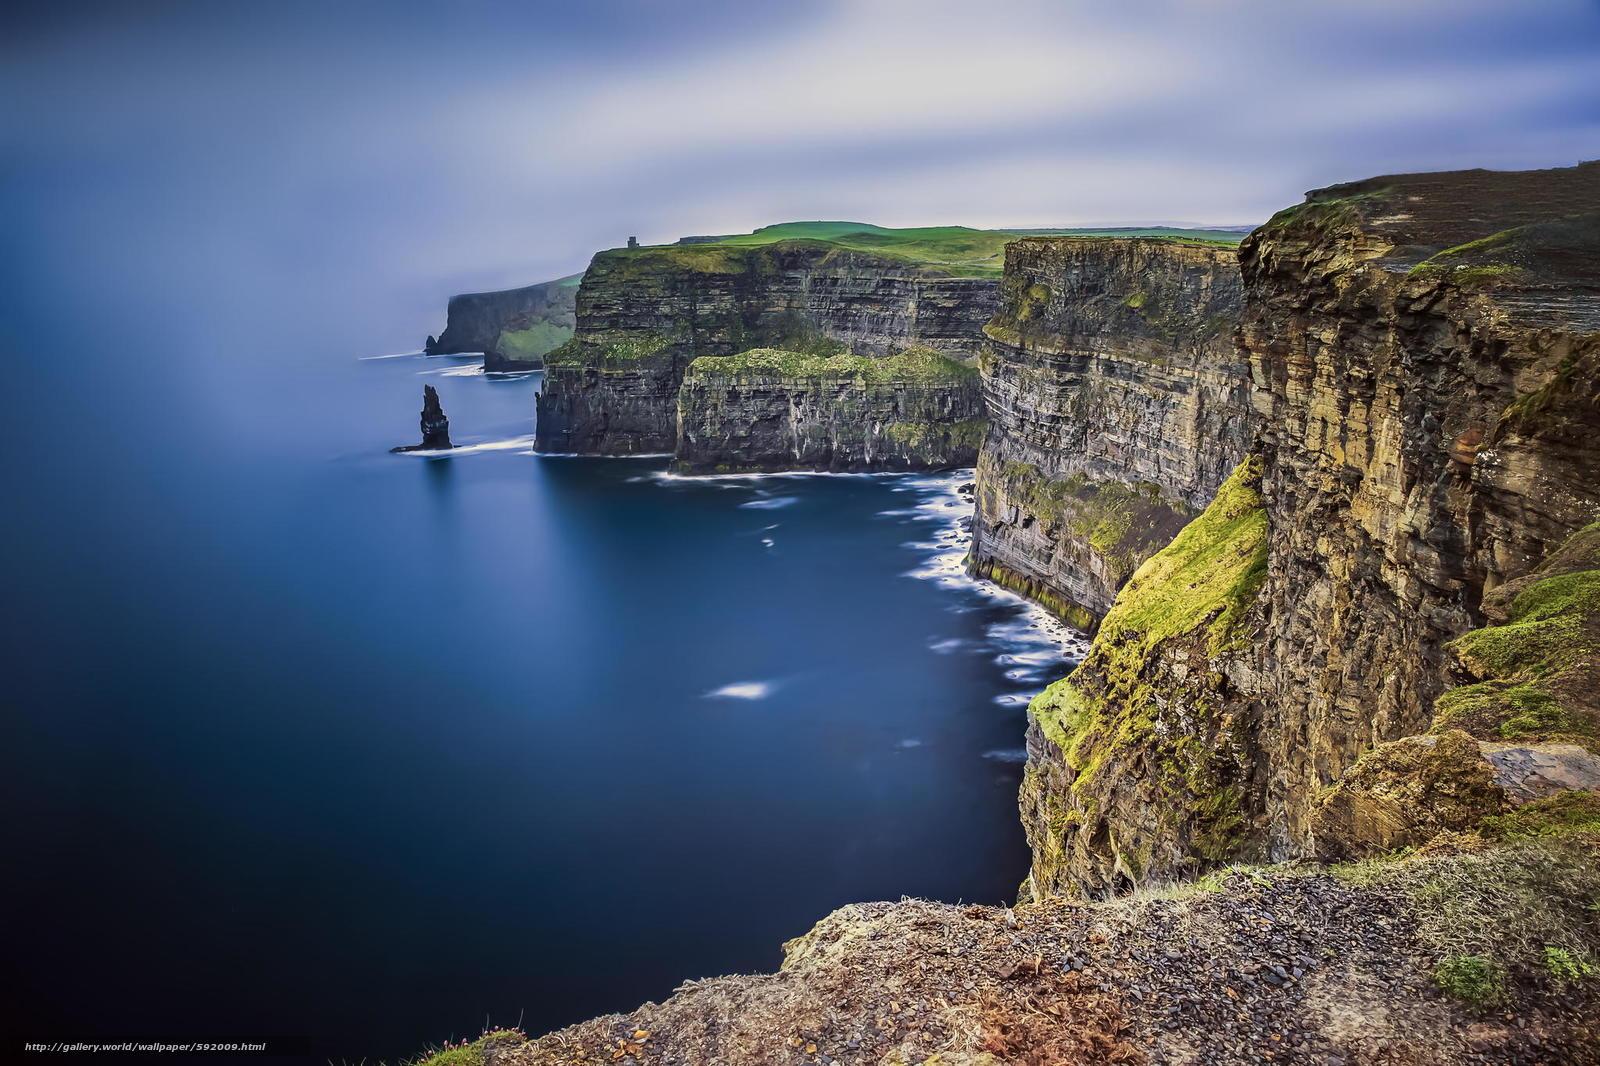 Tlcharger Fond Decran Mer Rocks Irlande Fonds